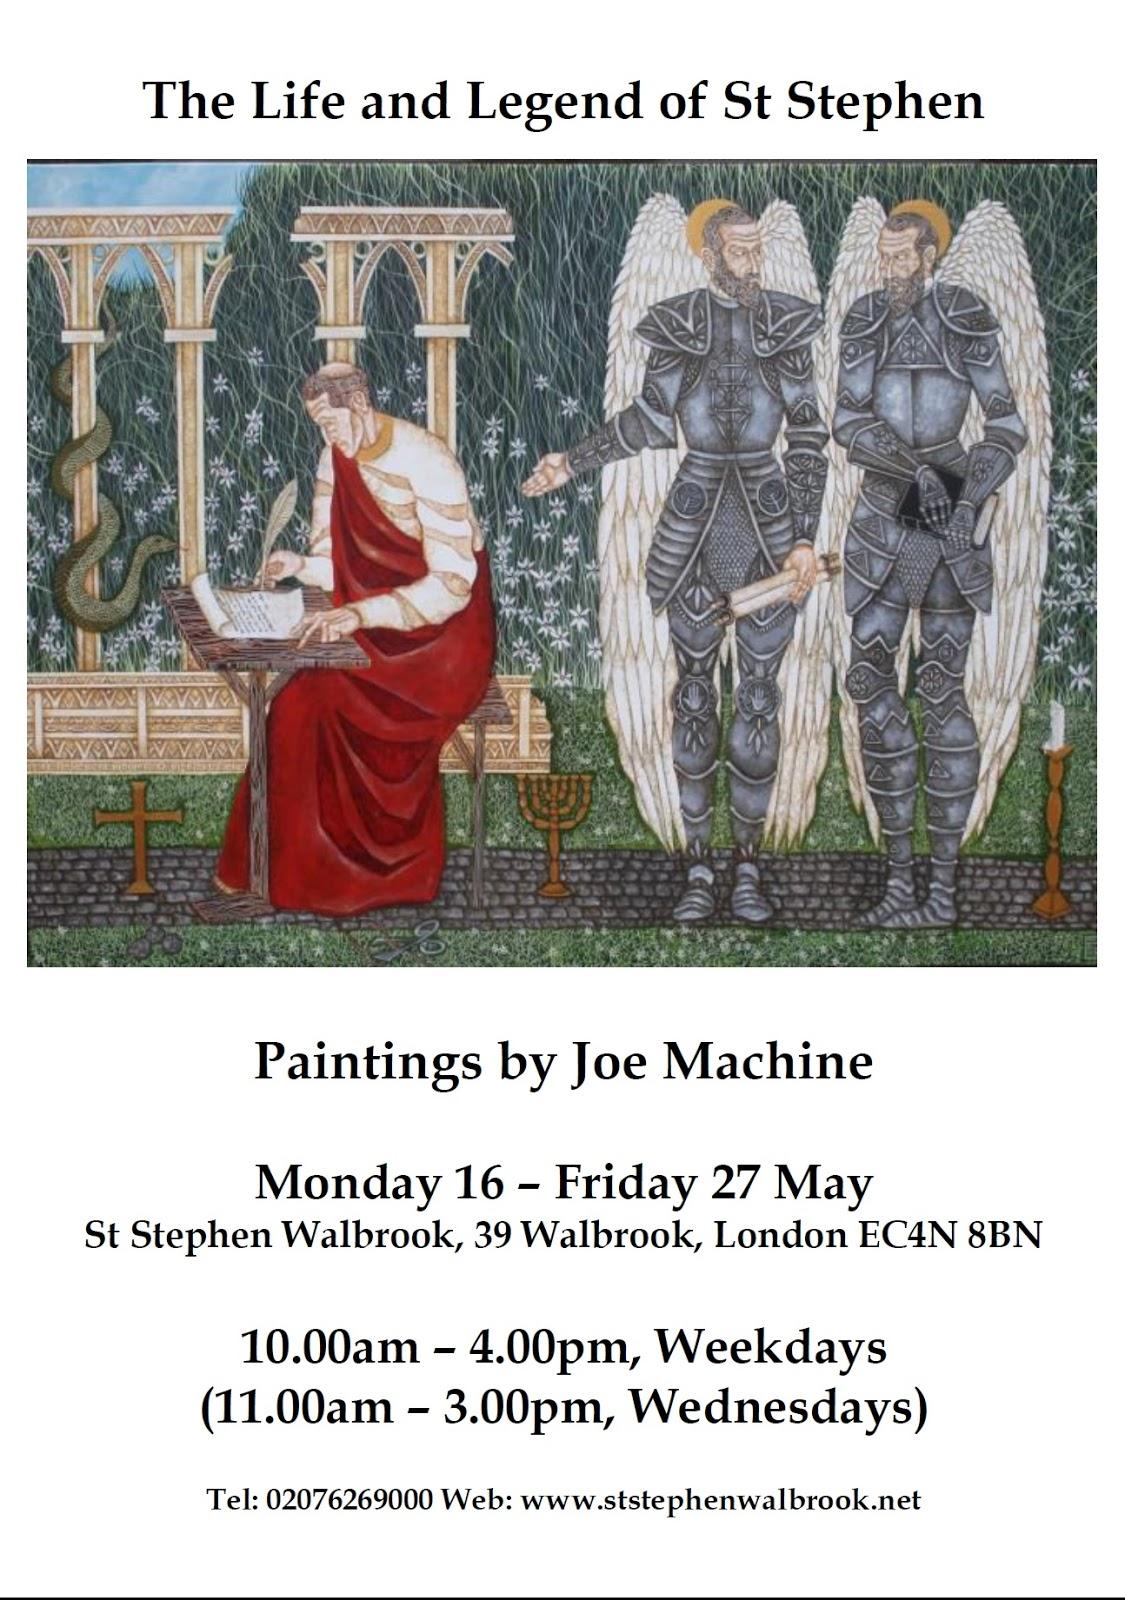 Between: Joe Machine, Edward Lucie-Smith & Claudio Crismani (2)